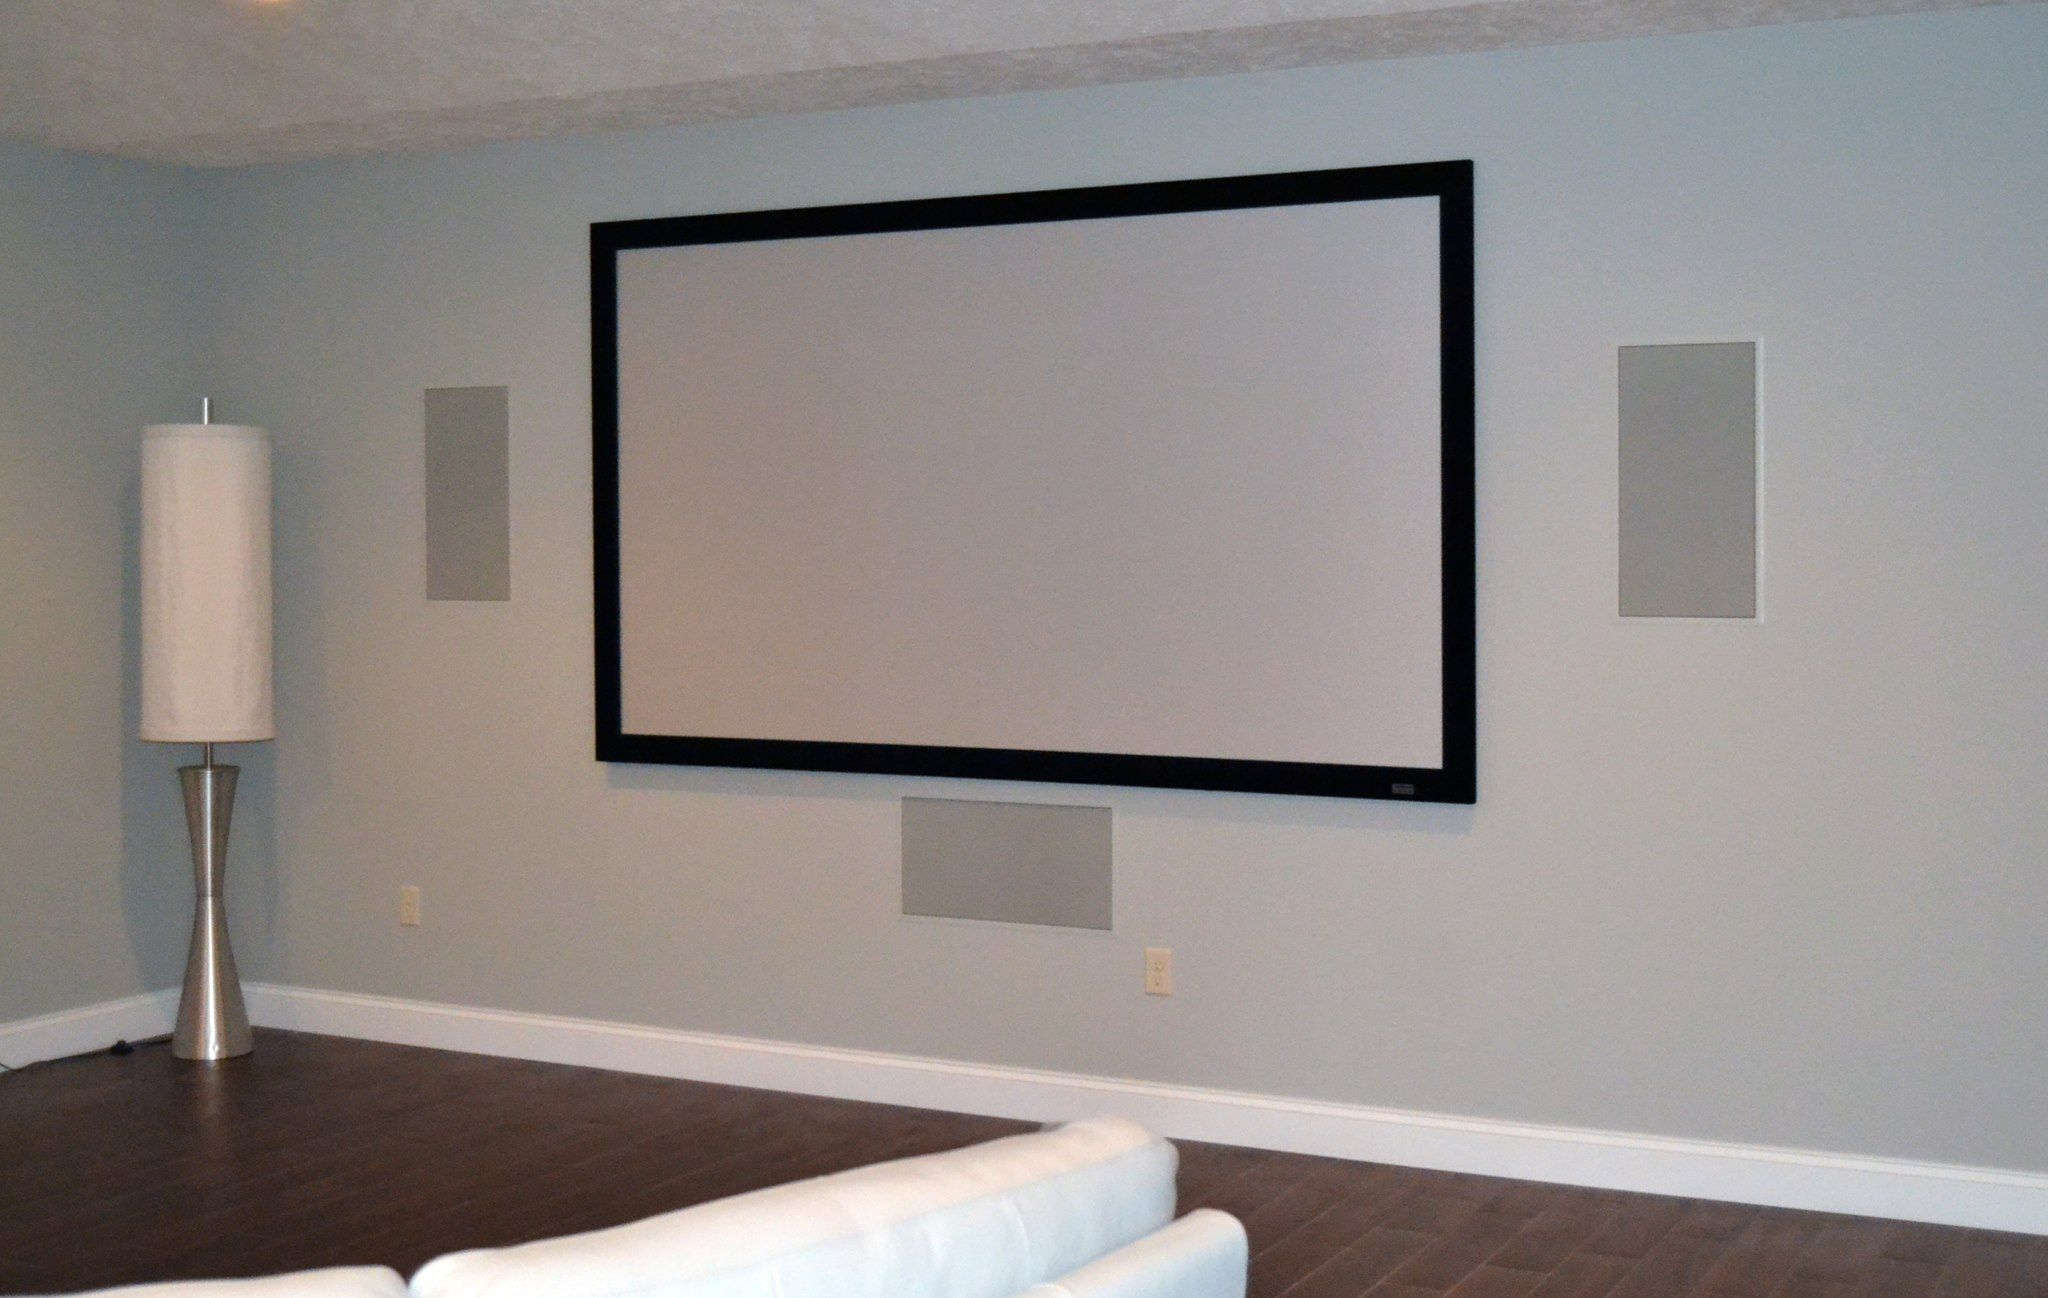 92 Quot Severtson Screen Epson Pro Cinema 6030 Projector